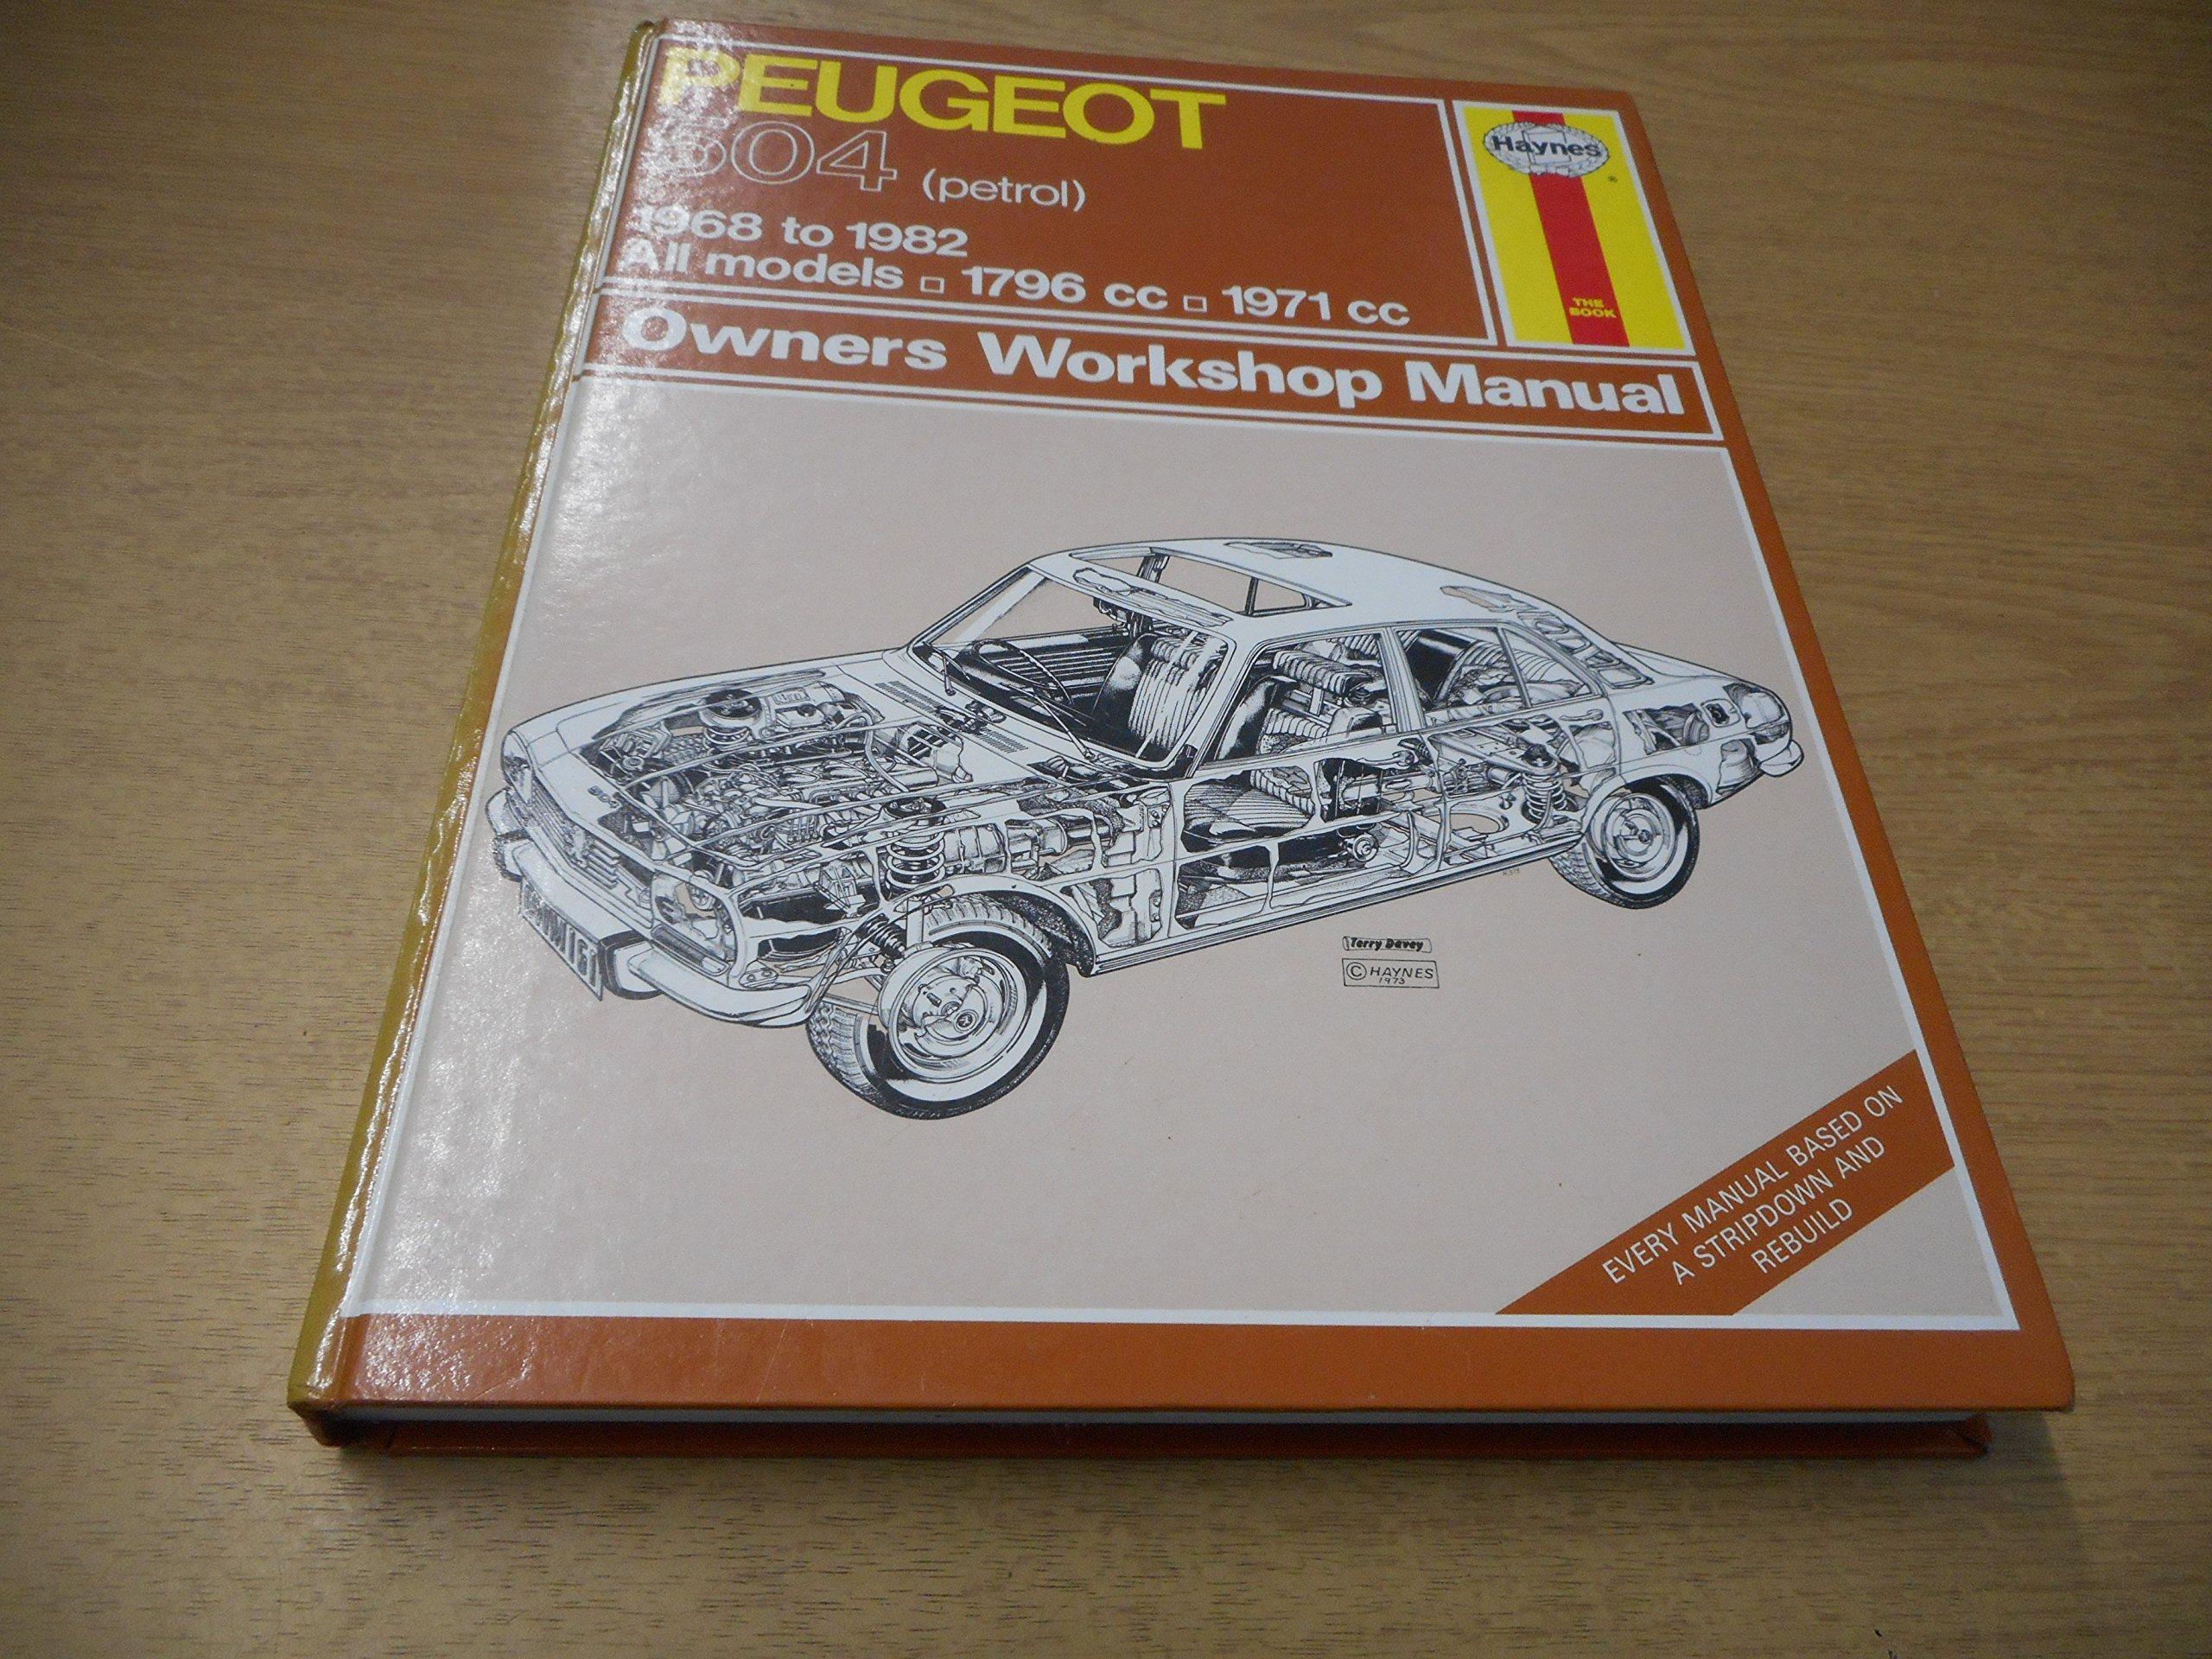 peugeot 504 petrol 1968 82 owner s workshop manual service rh amazon co uk Peugeot 607 Peugeot 405